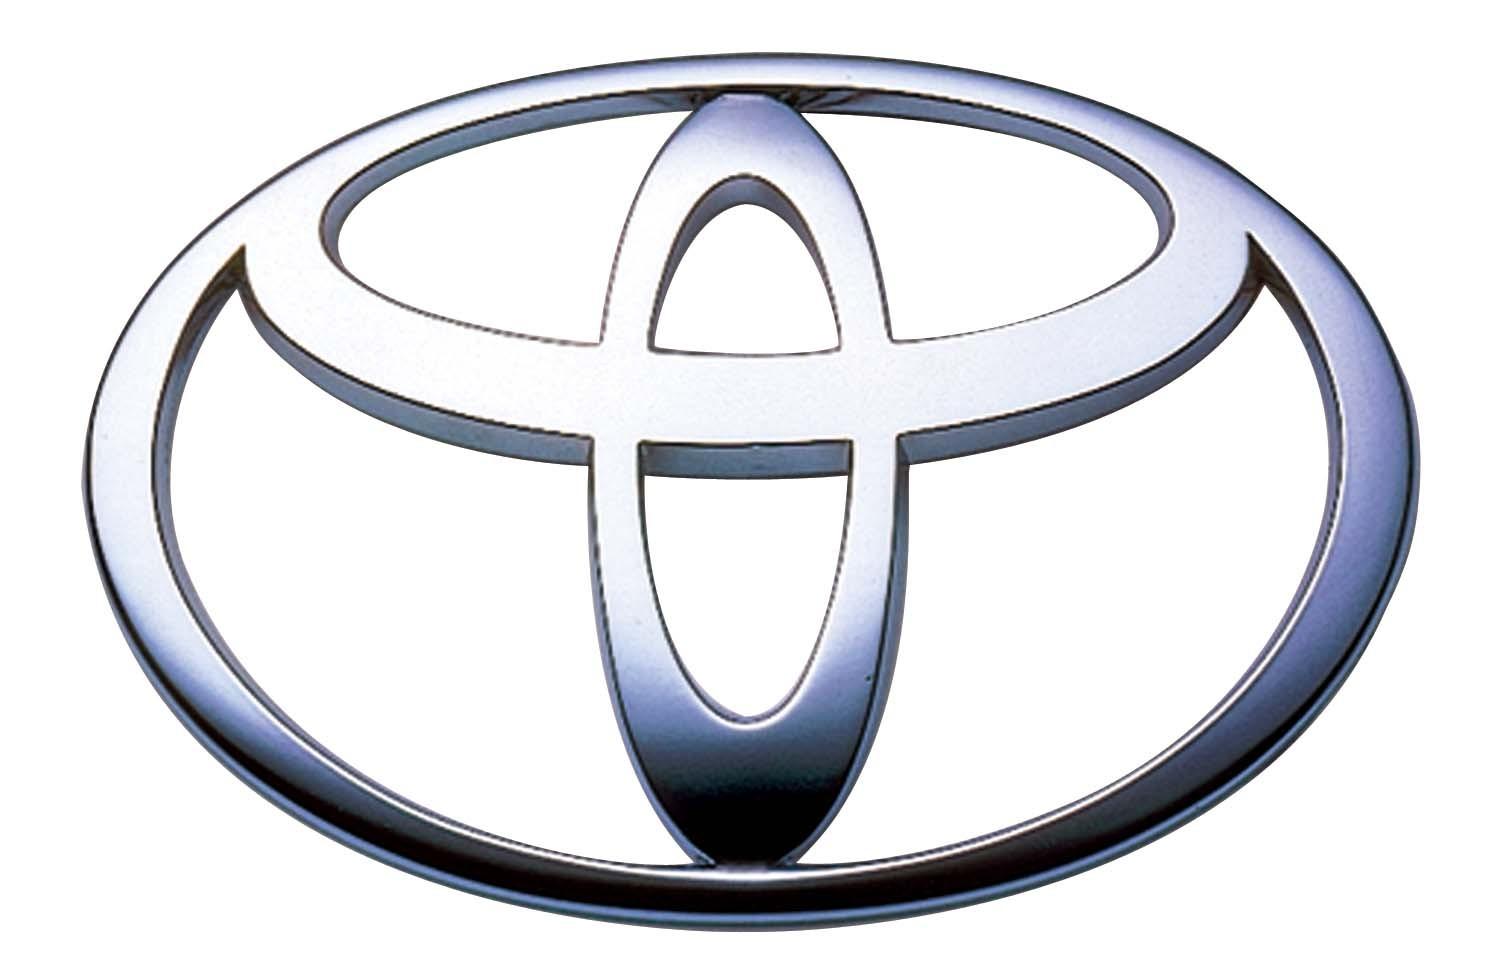 Mitos Dan Sisi Lain Toyota Avanza Oleh Dzulfikar